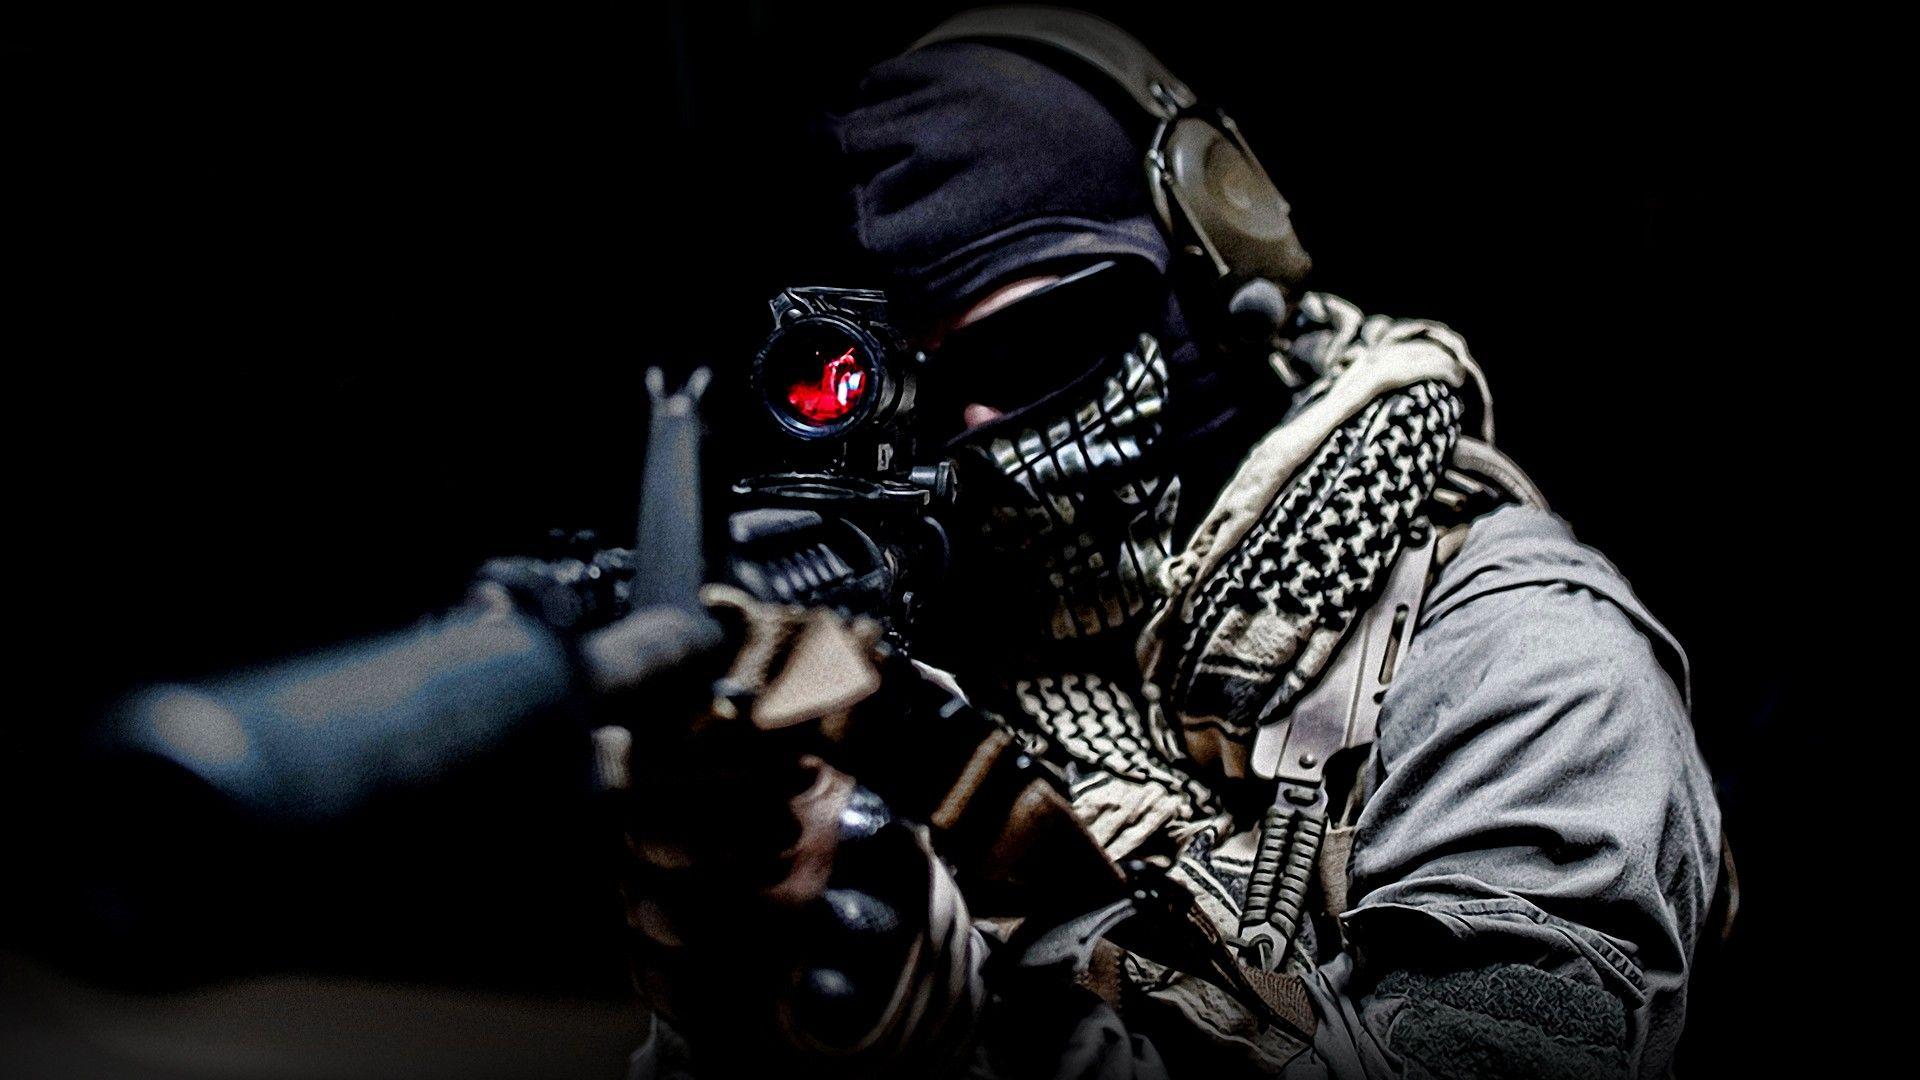 Call Of Duty Modern Warfare Mw Wallpaper Lold Wallpaper Call Of Duty Ghosts Call Of Duty Guns Wallpaper